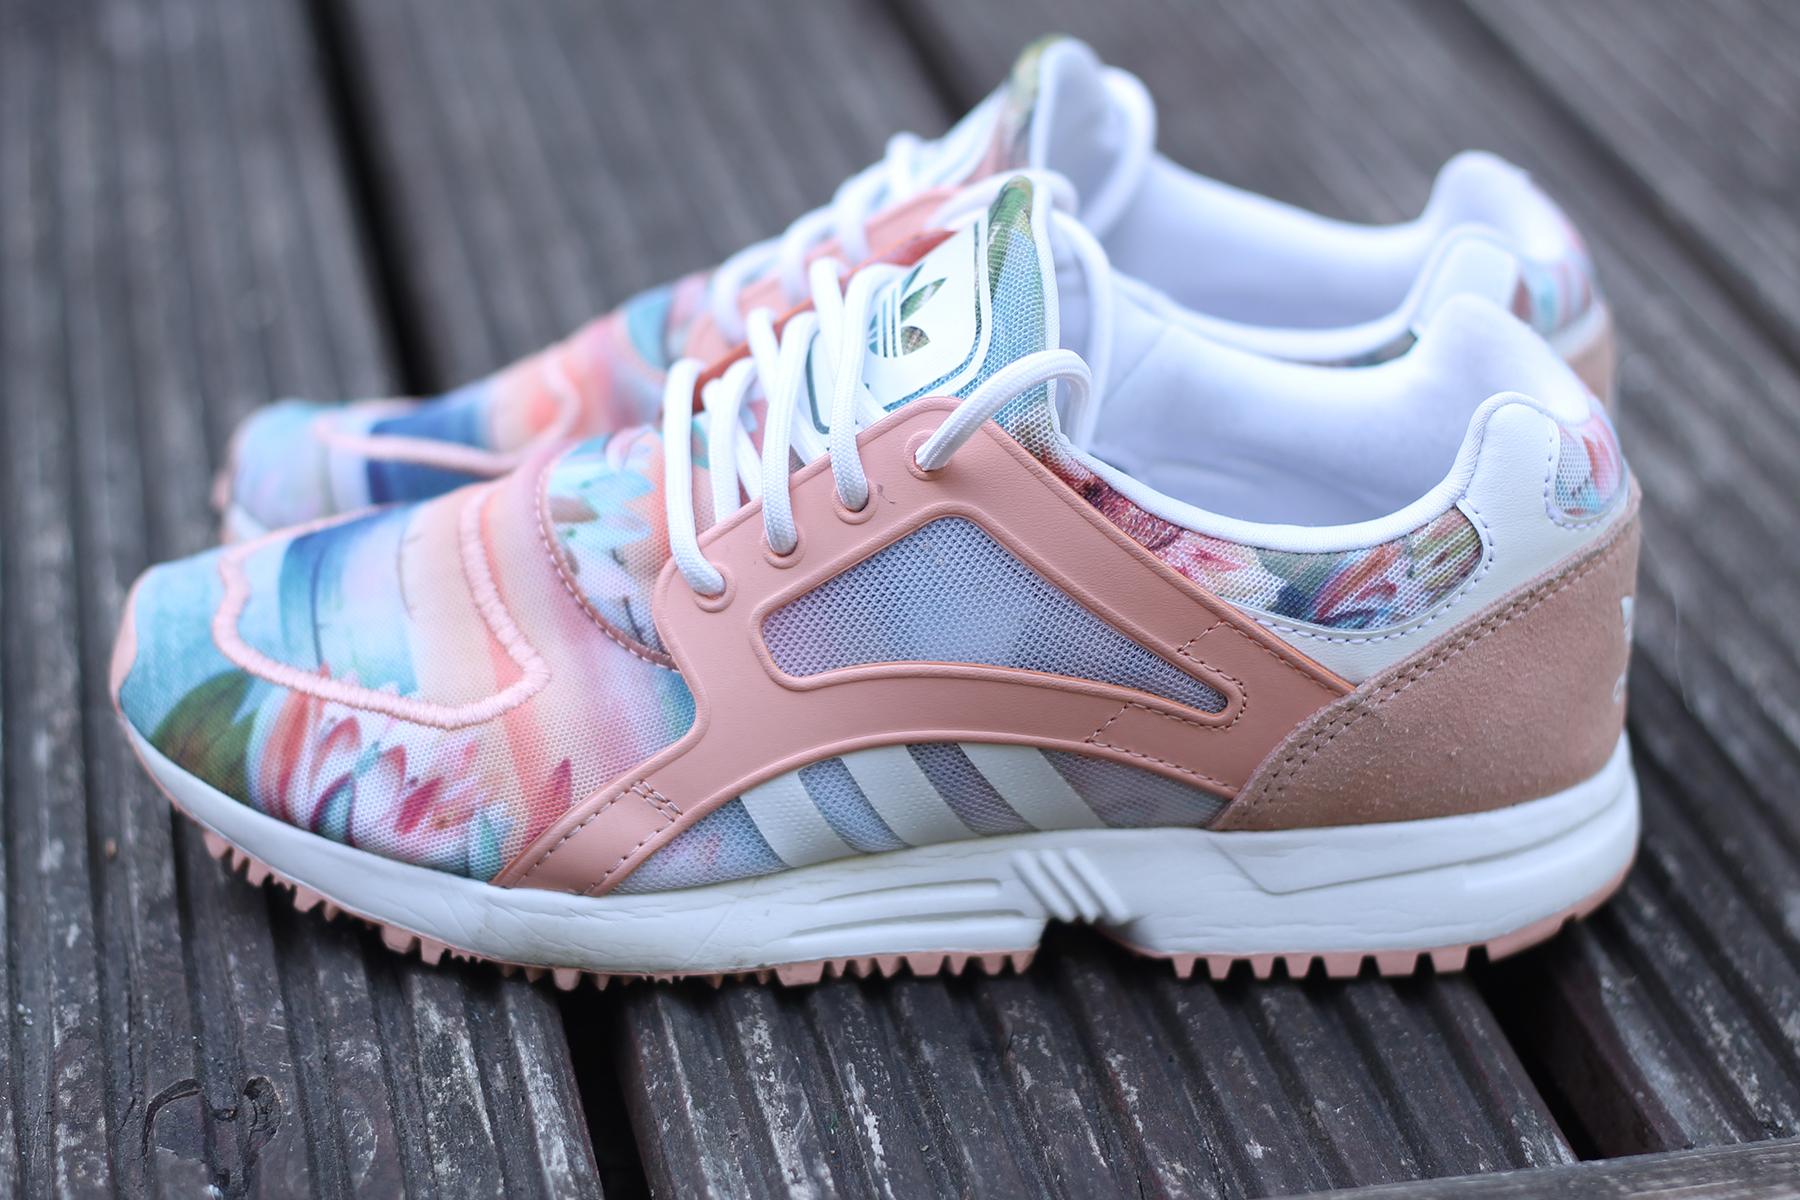 adidas-rosa-flux-sneaker-blogger-modeblog-fashionblog-schuhe